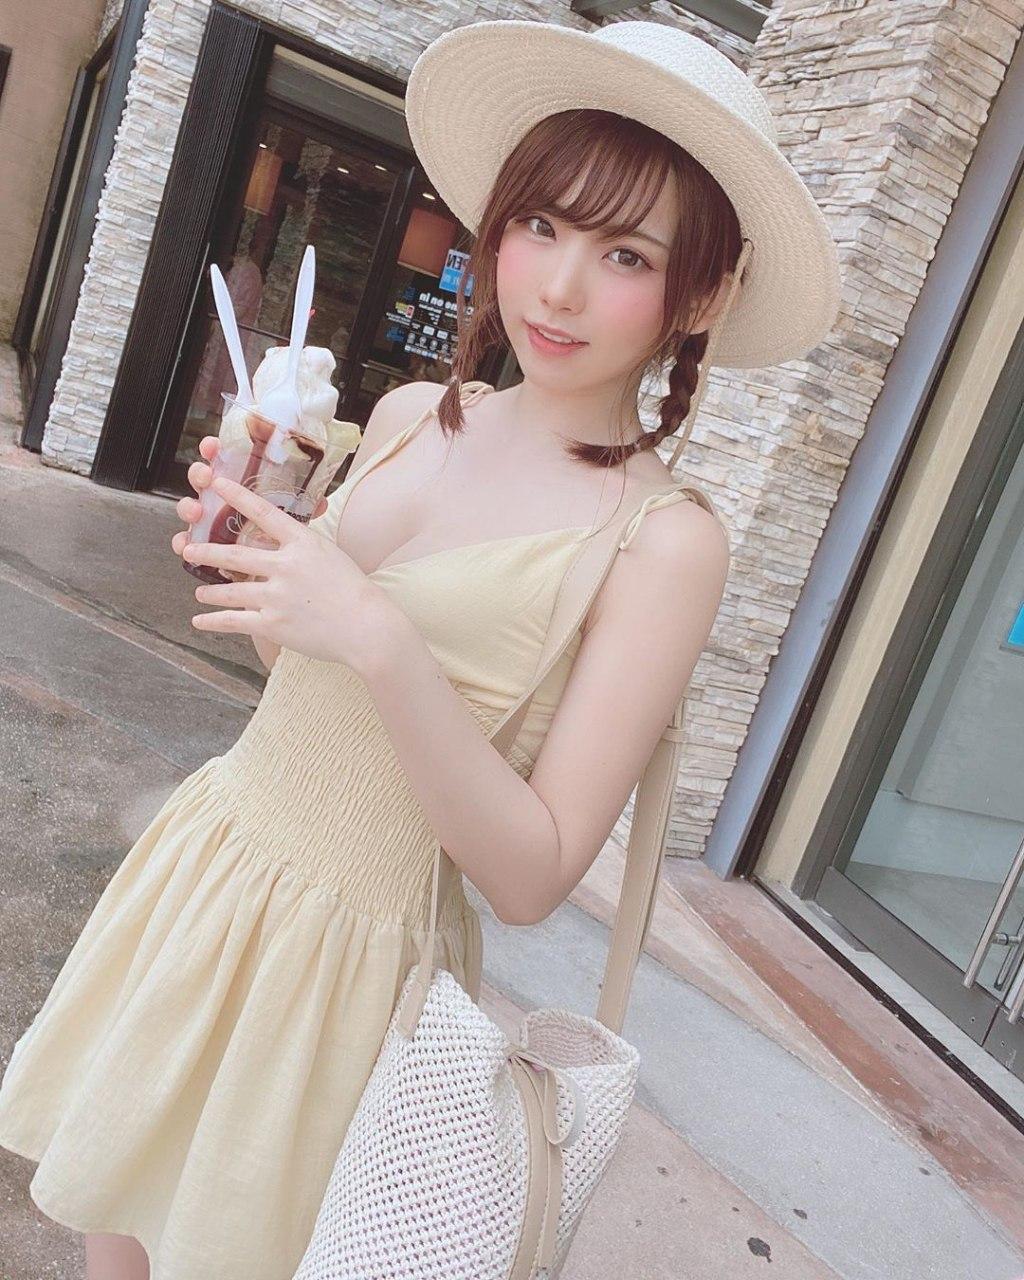 photo_3644@11-03-2020_01-03-48.jpg